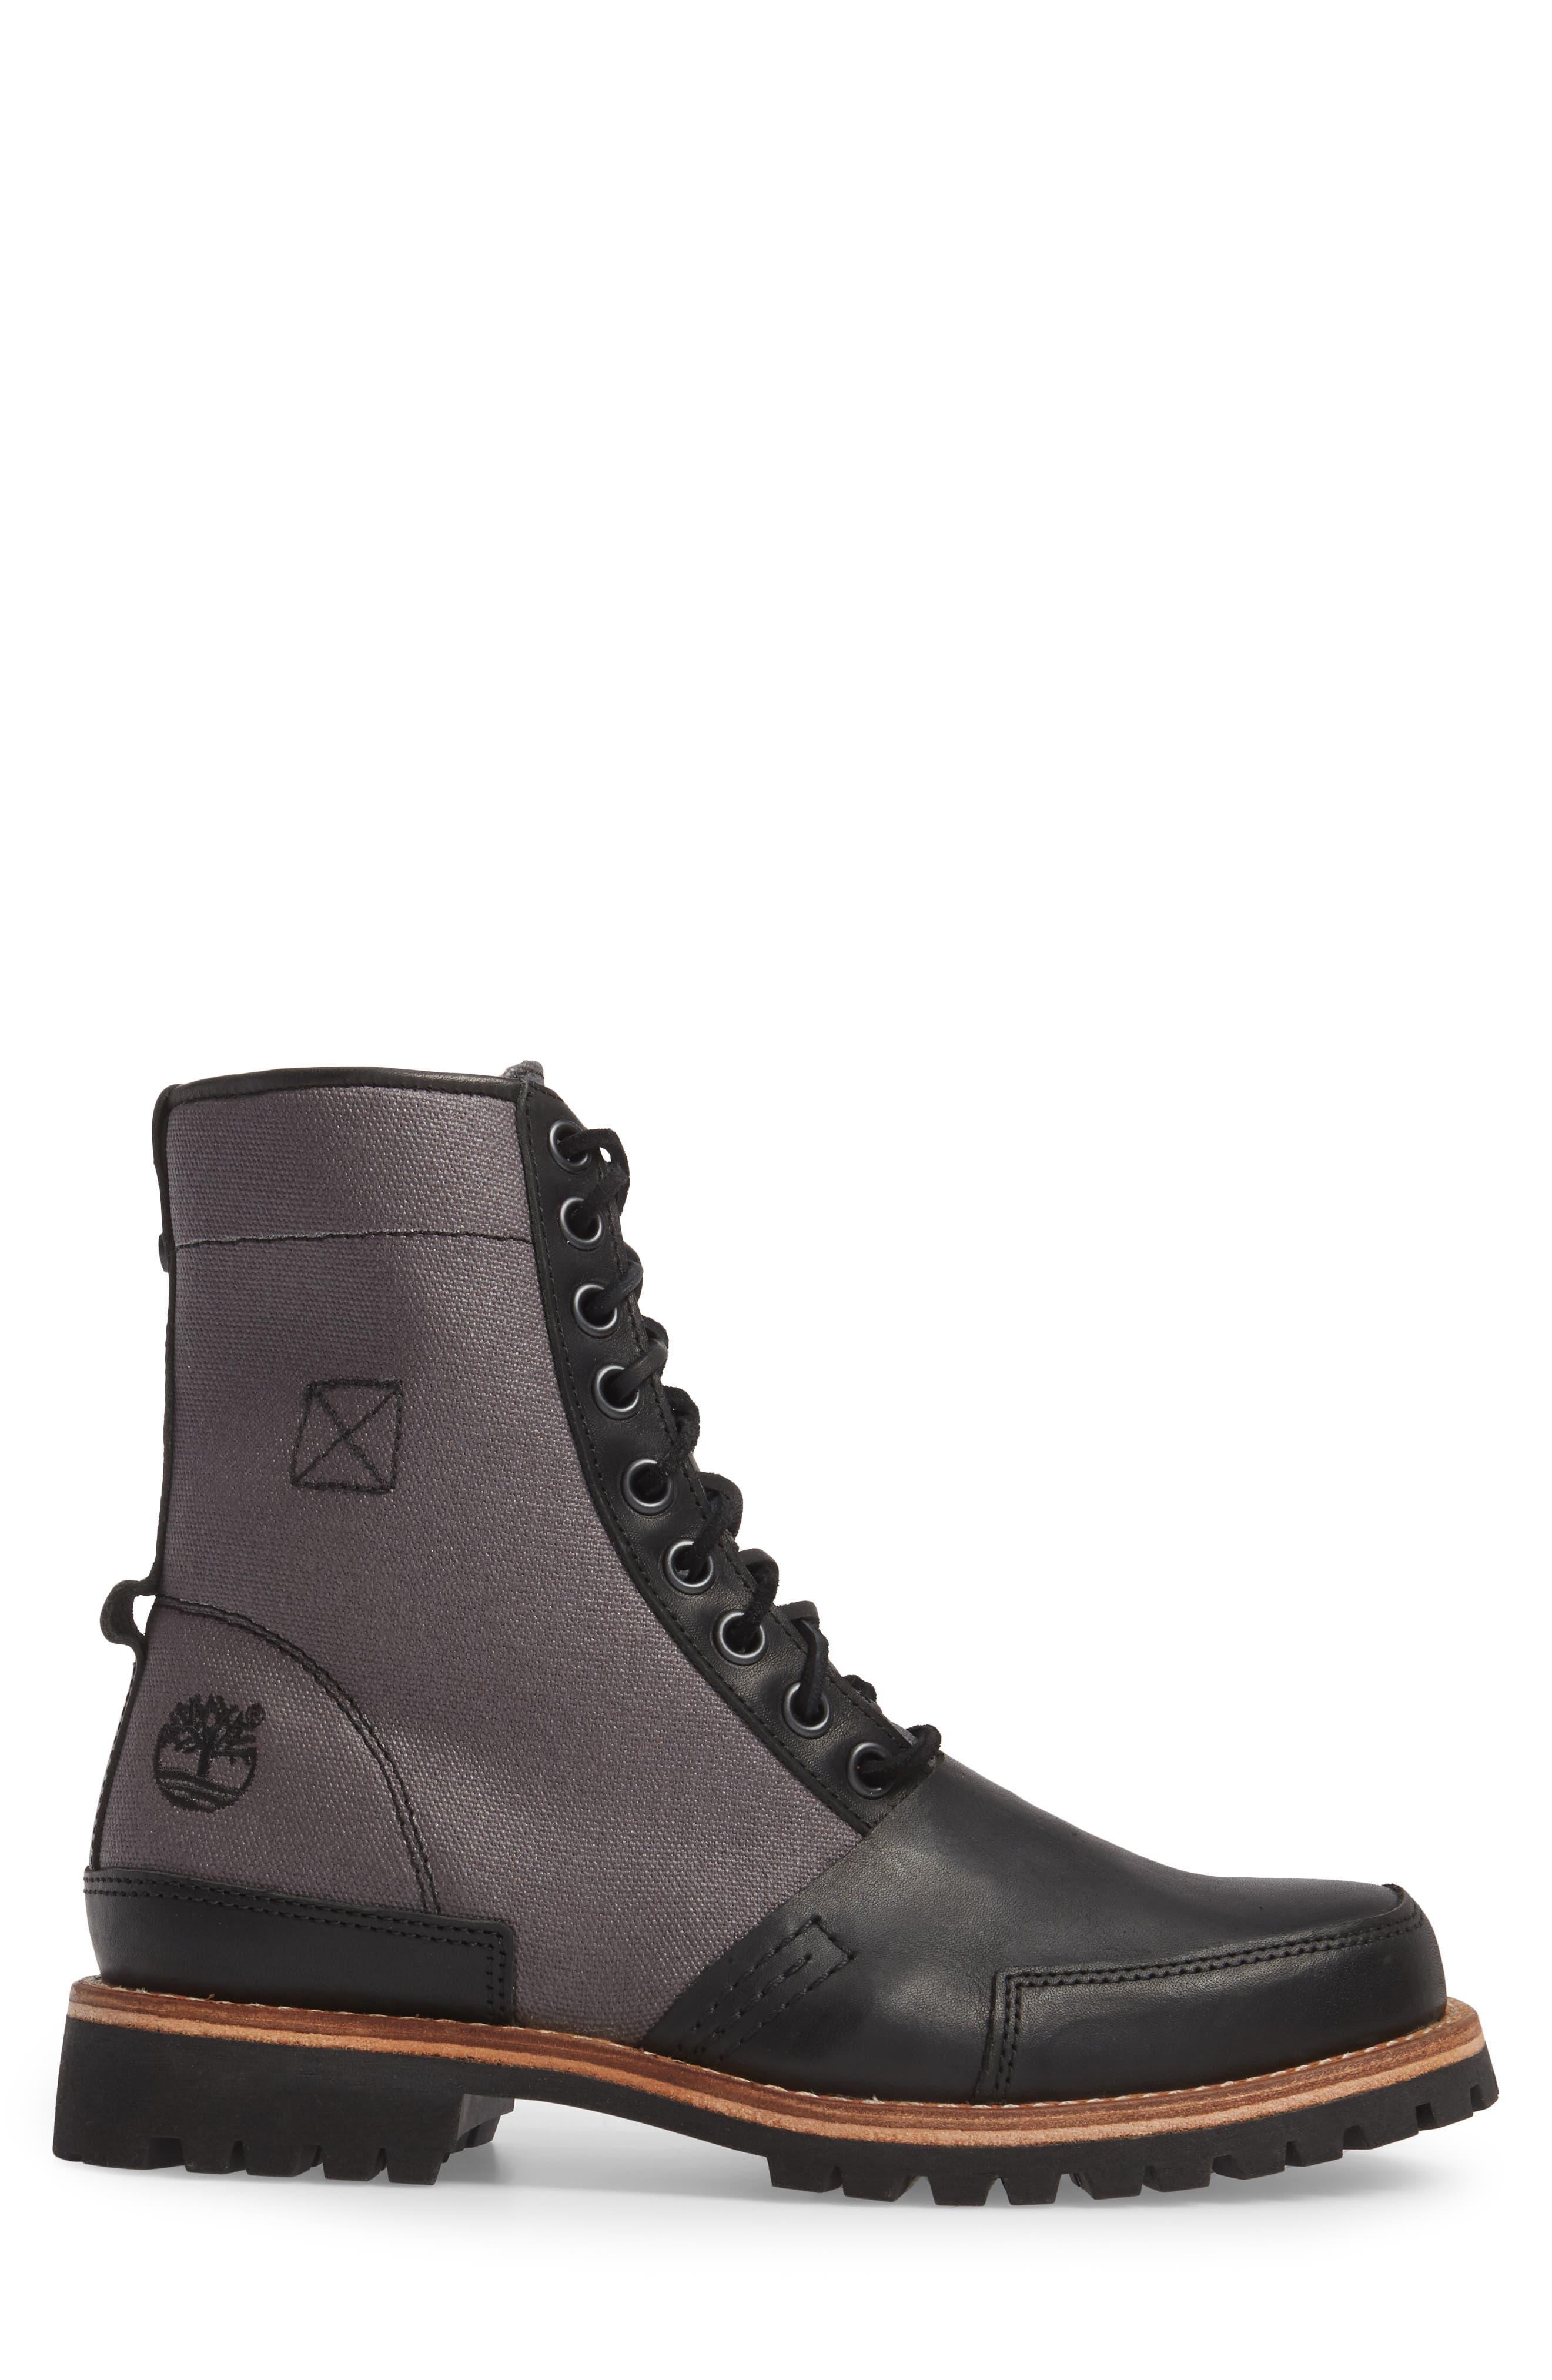 LTD Lug Mixed Media Water-Repellent Boot,                             Alternate thumbnail 3, color,                             001